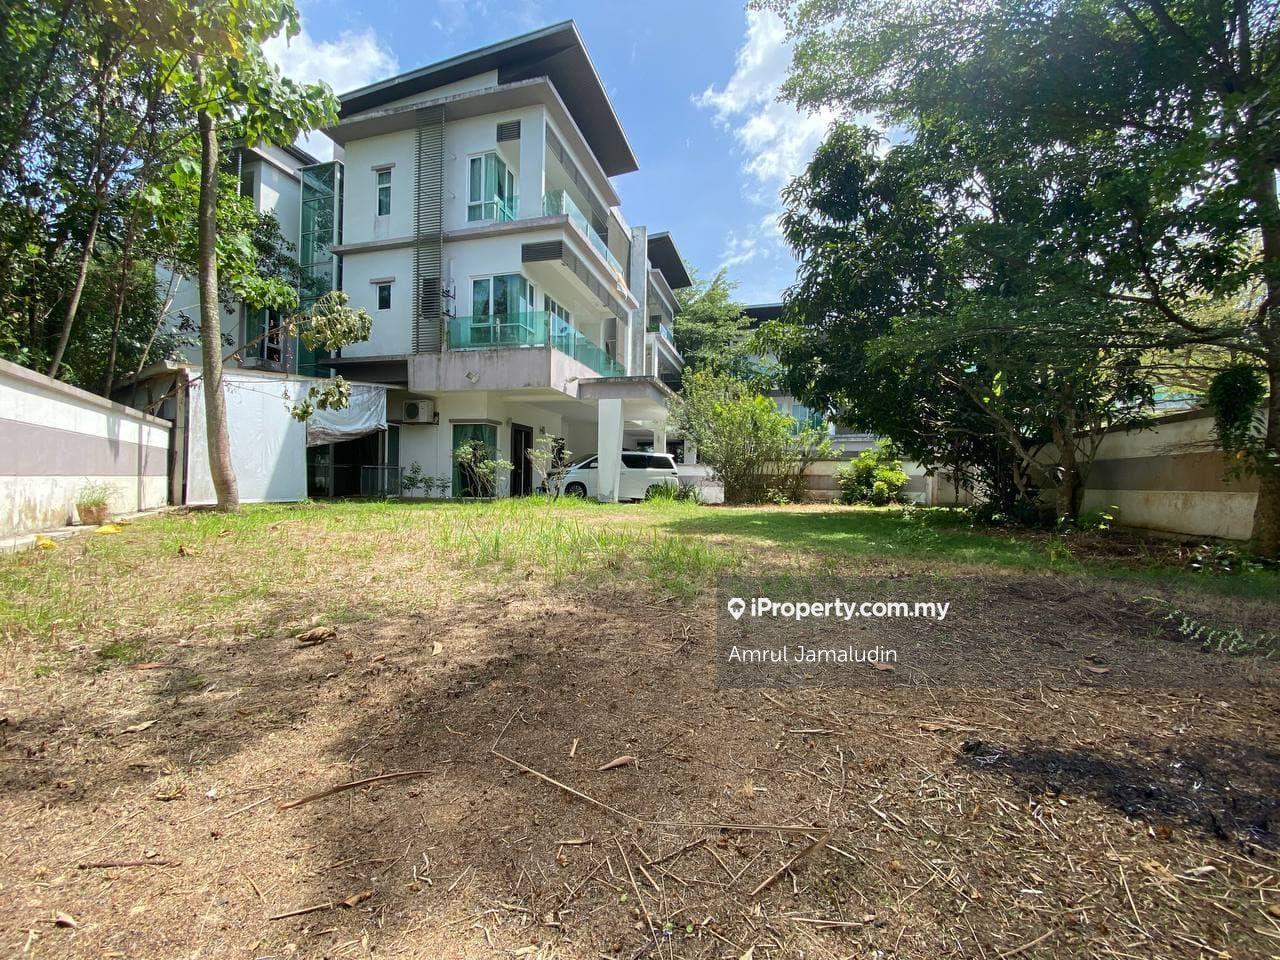 Beverly Heights Near Sering, Tropika, Tijani, Nusa, Ulu Klang